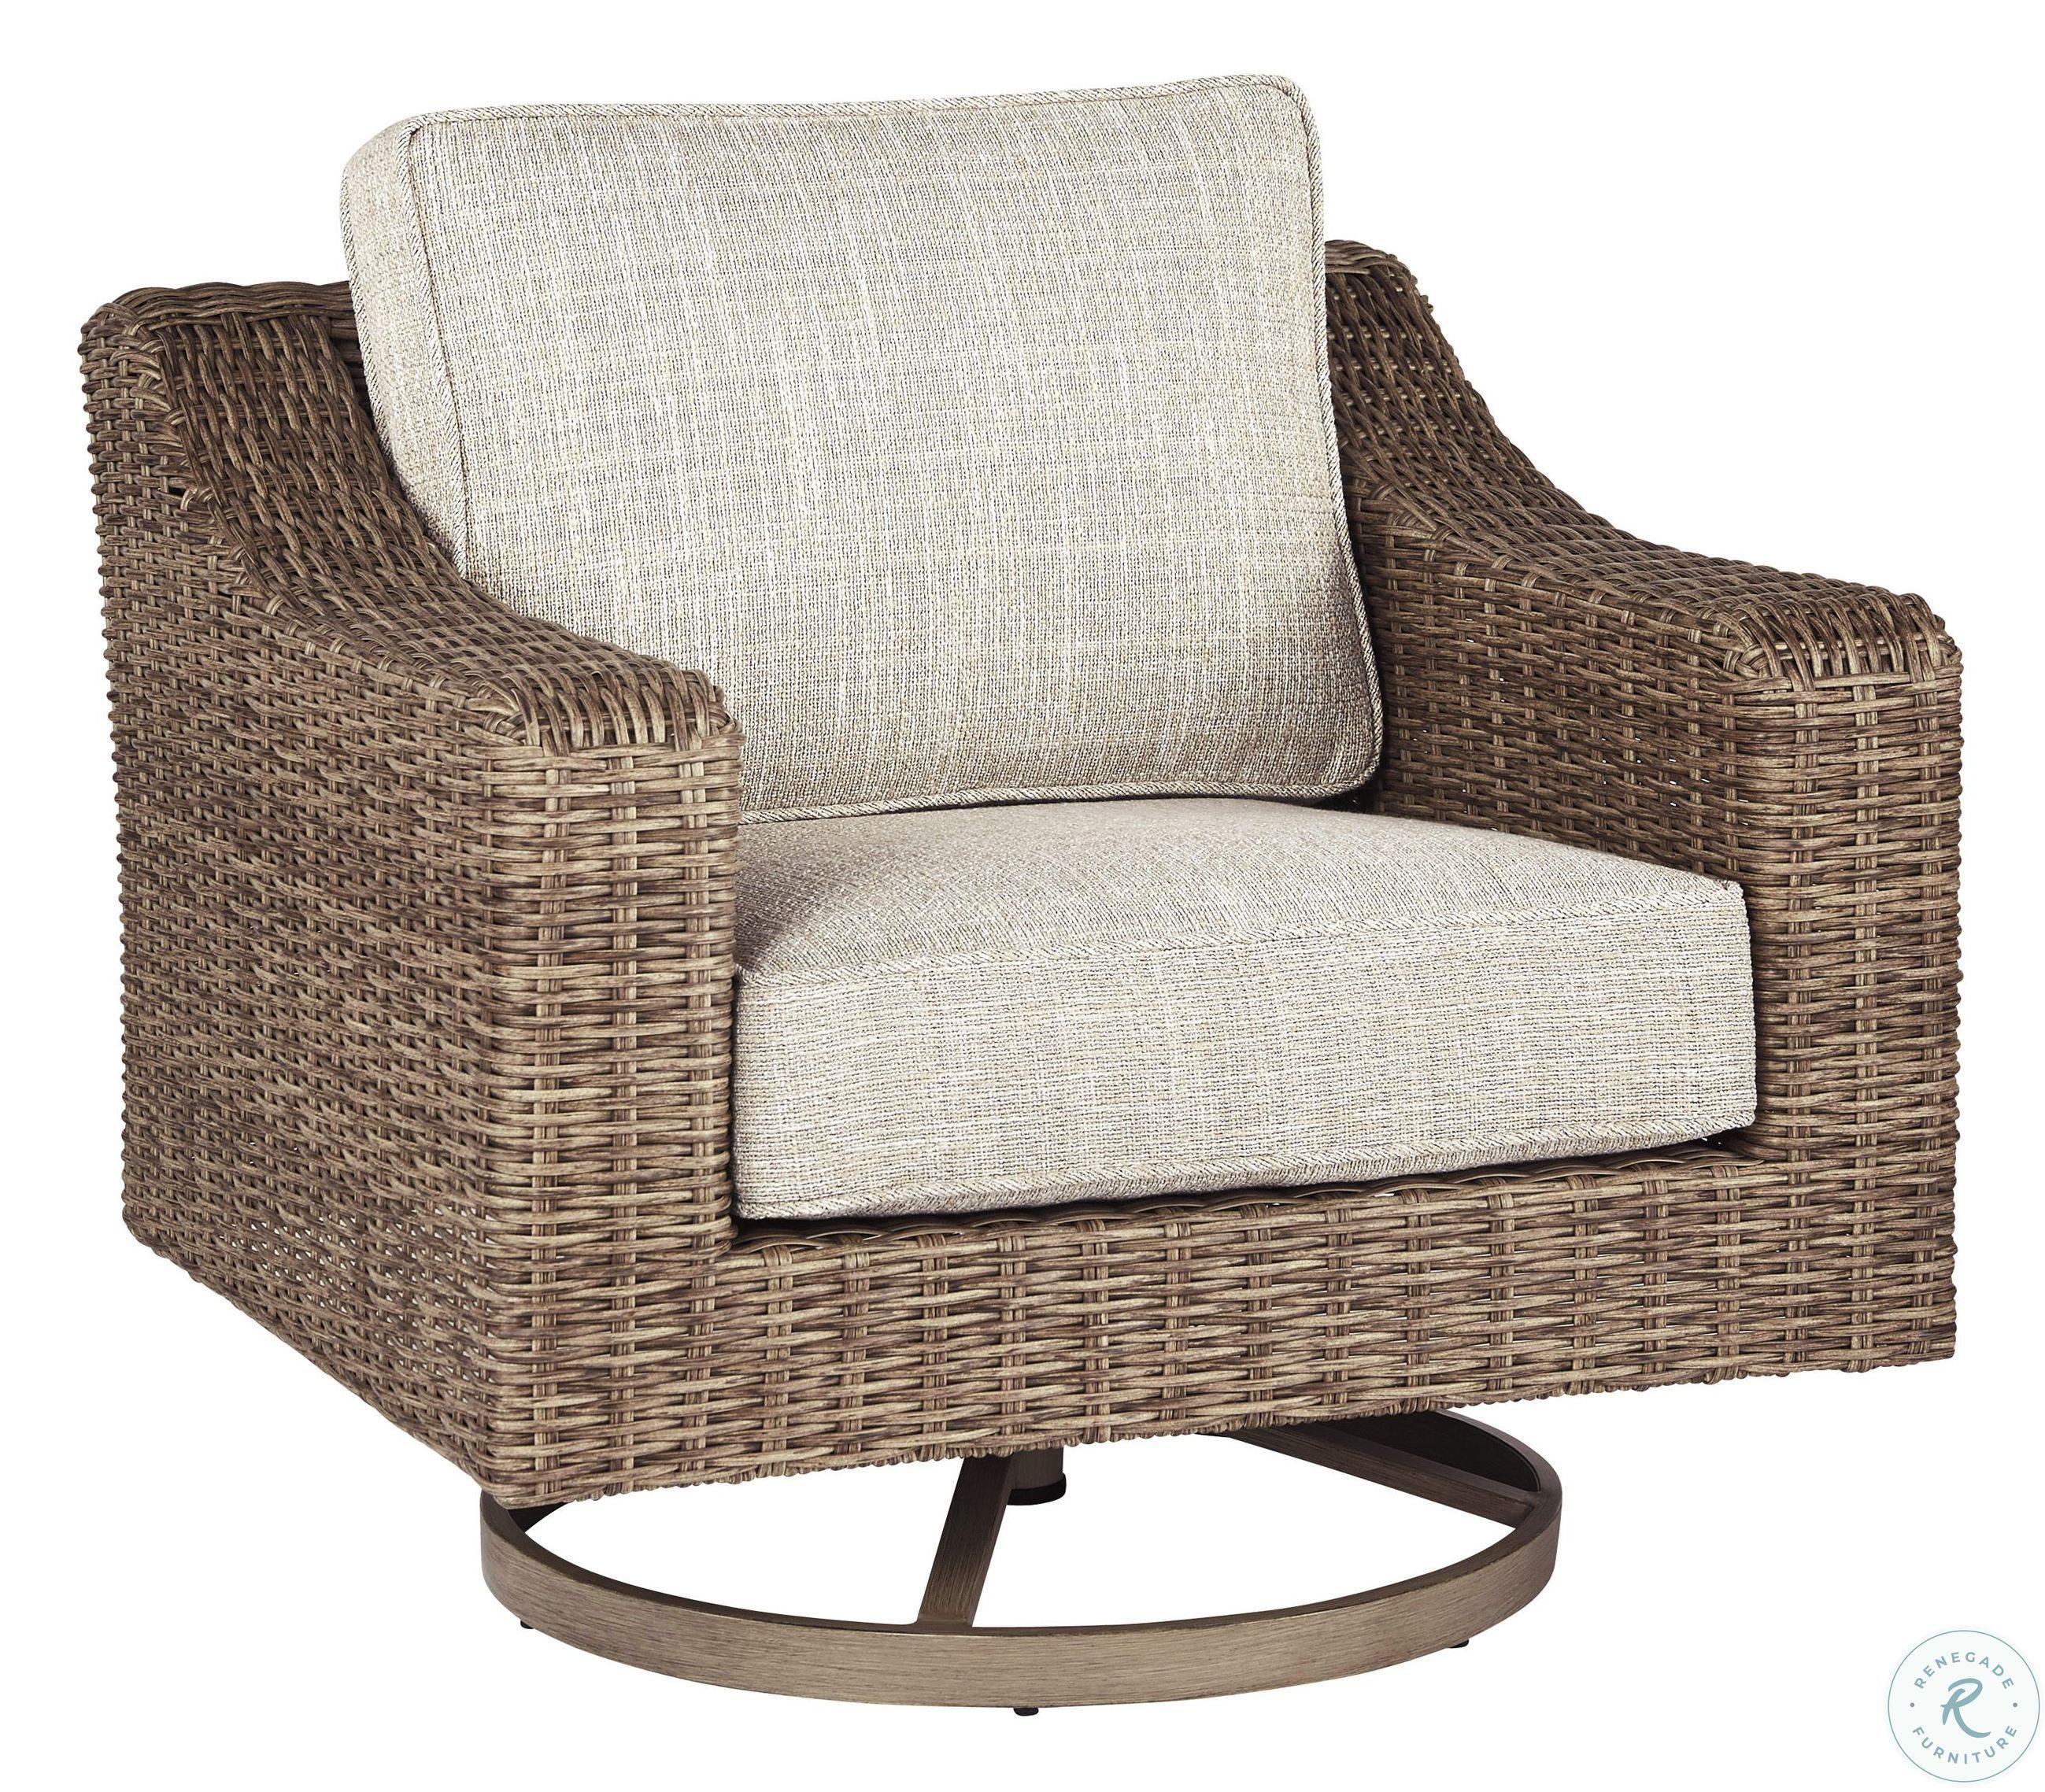 Beachcroft Beige Outdoor Swivel Lounge Chair - ASL-P791 ... on Beachcroft Beige Outdoor Living Room Set id=55460